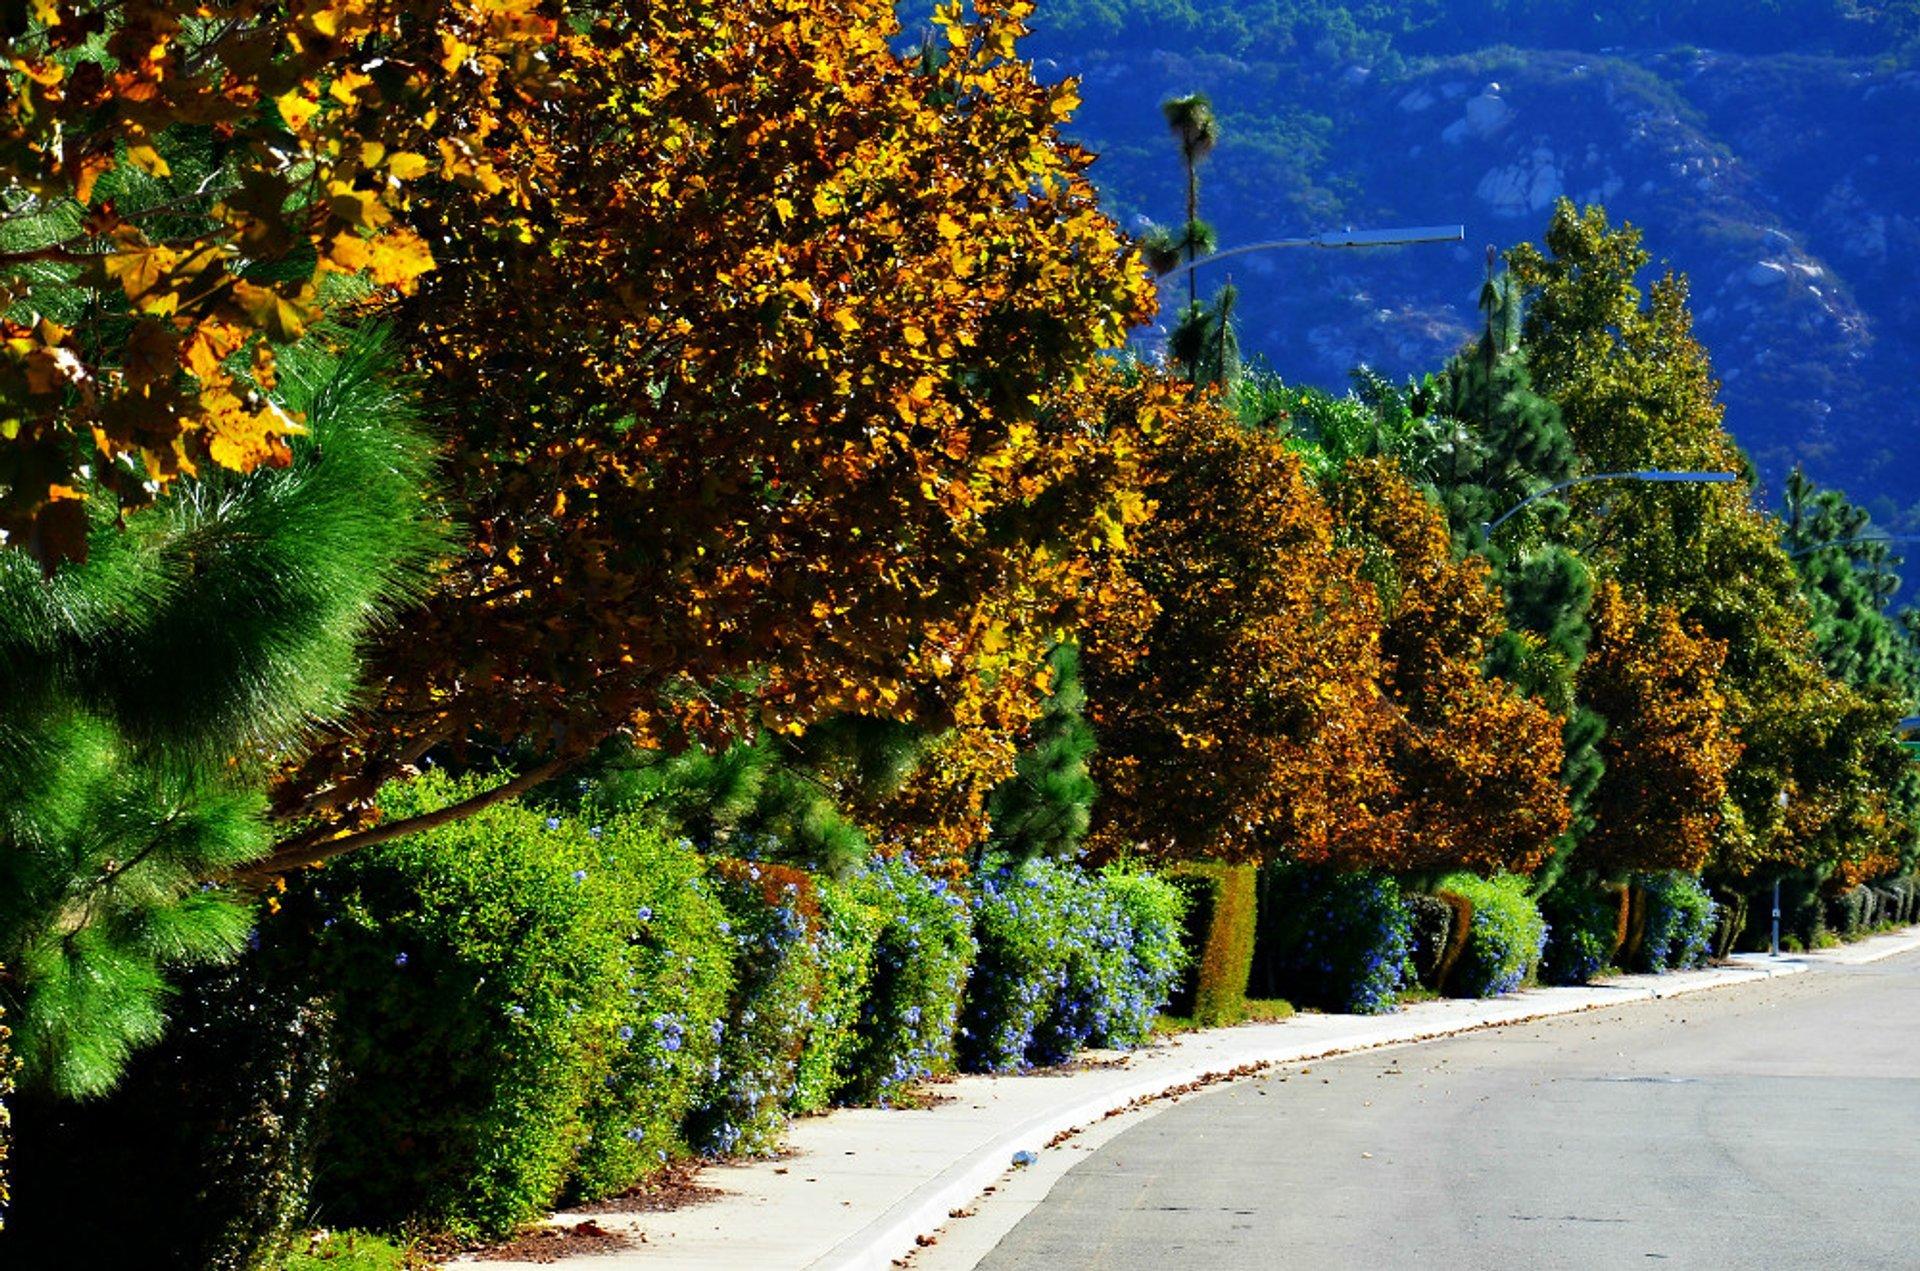 Crisp fall morning in San Diego, Southern California 2020